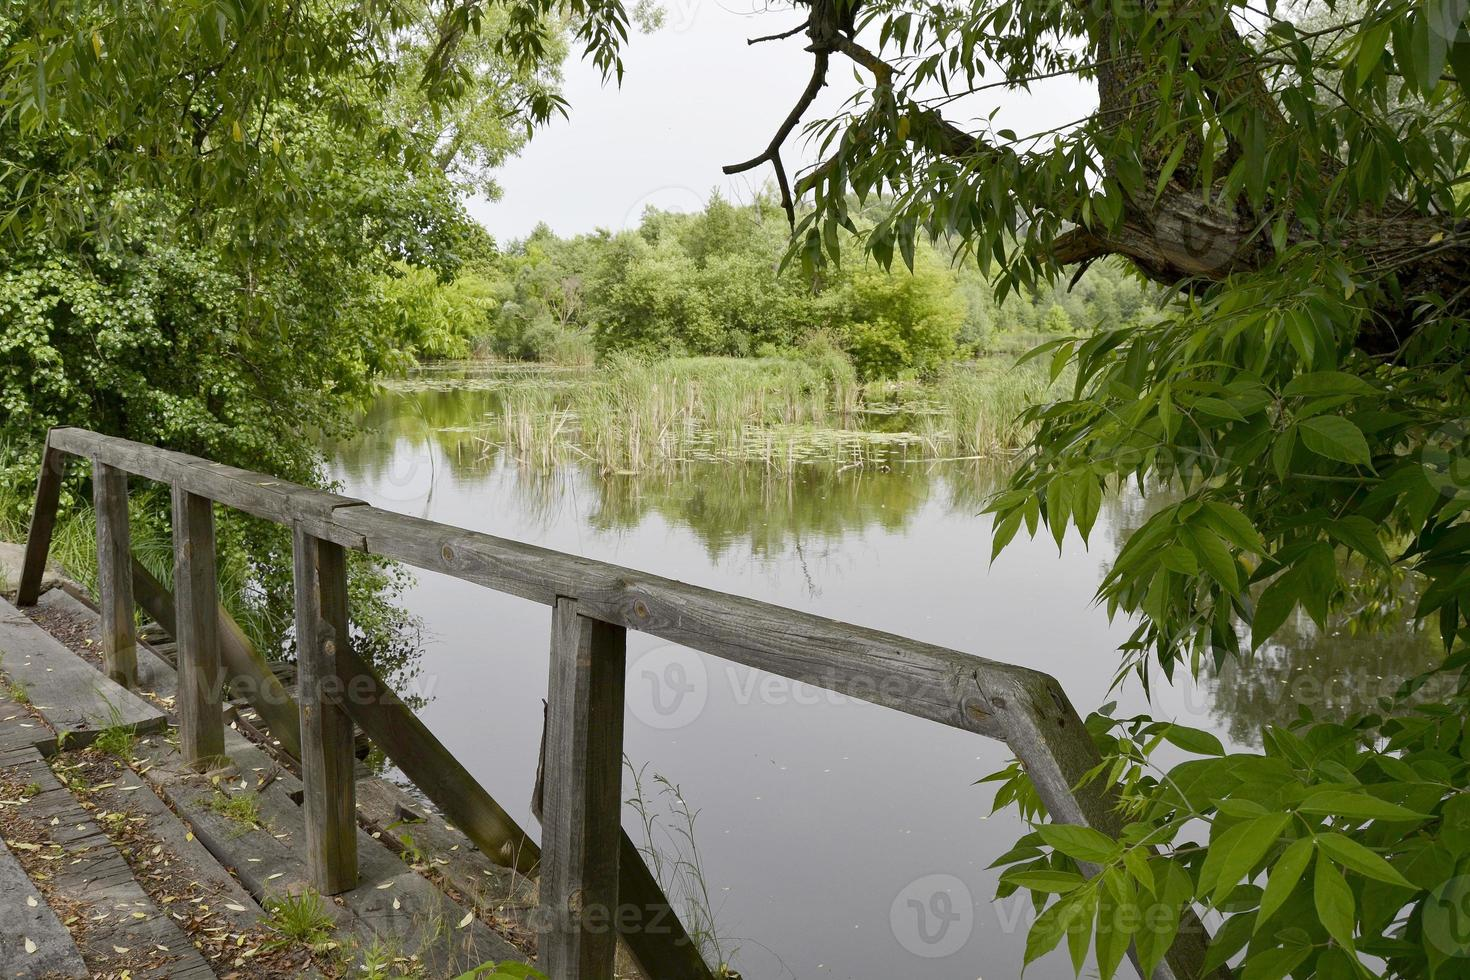 Wooden bridge over river photo